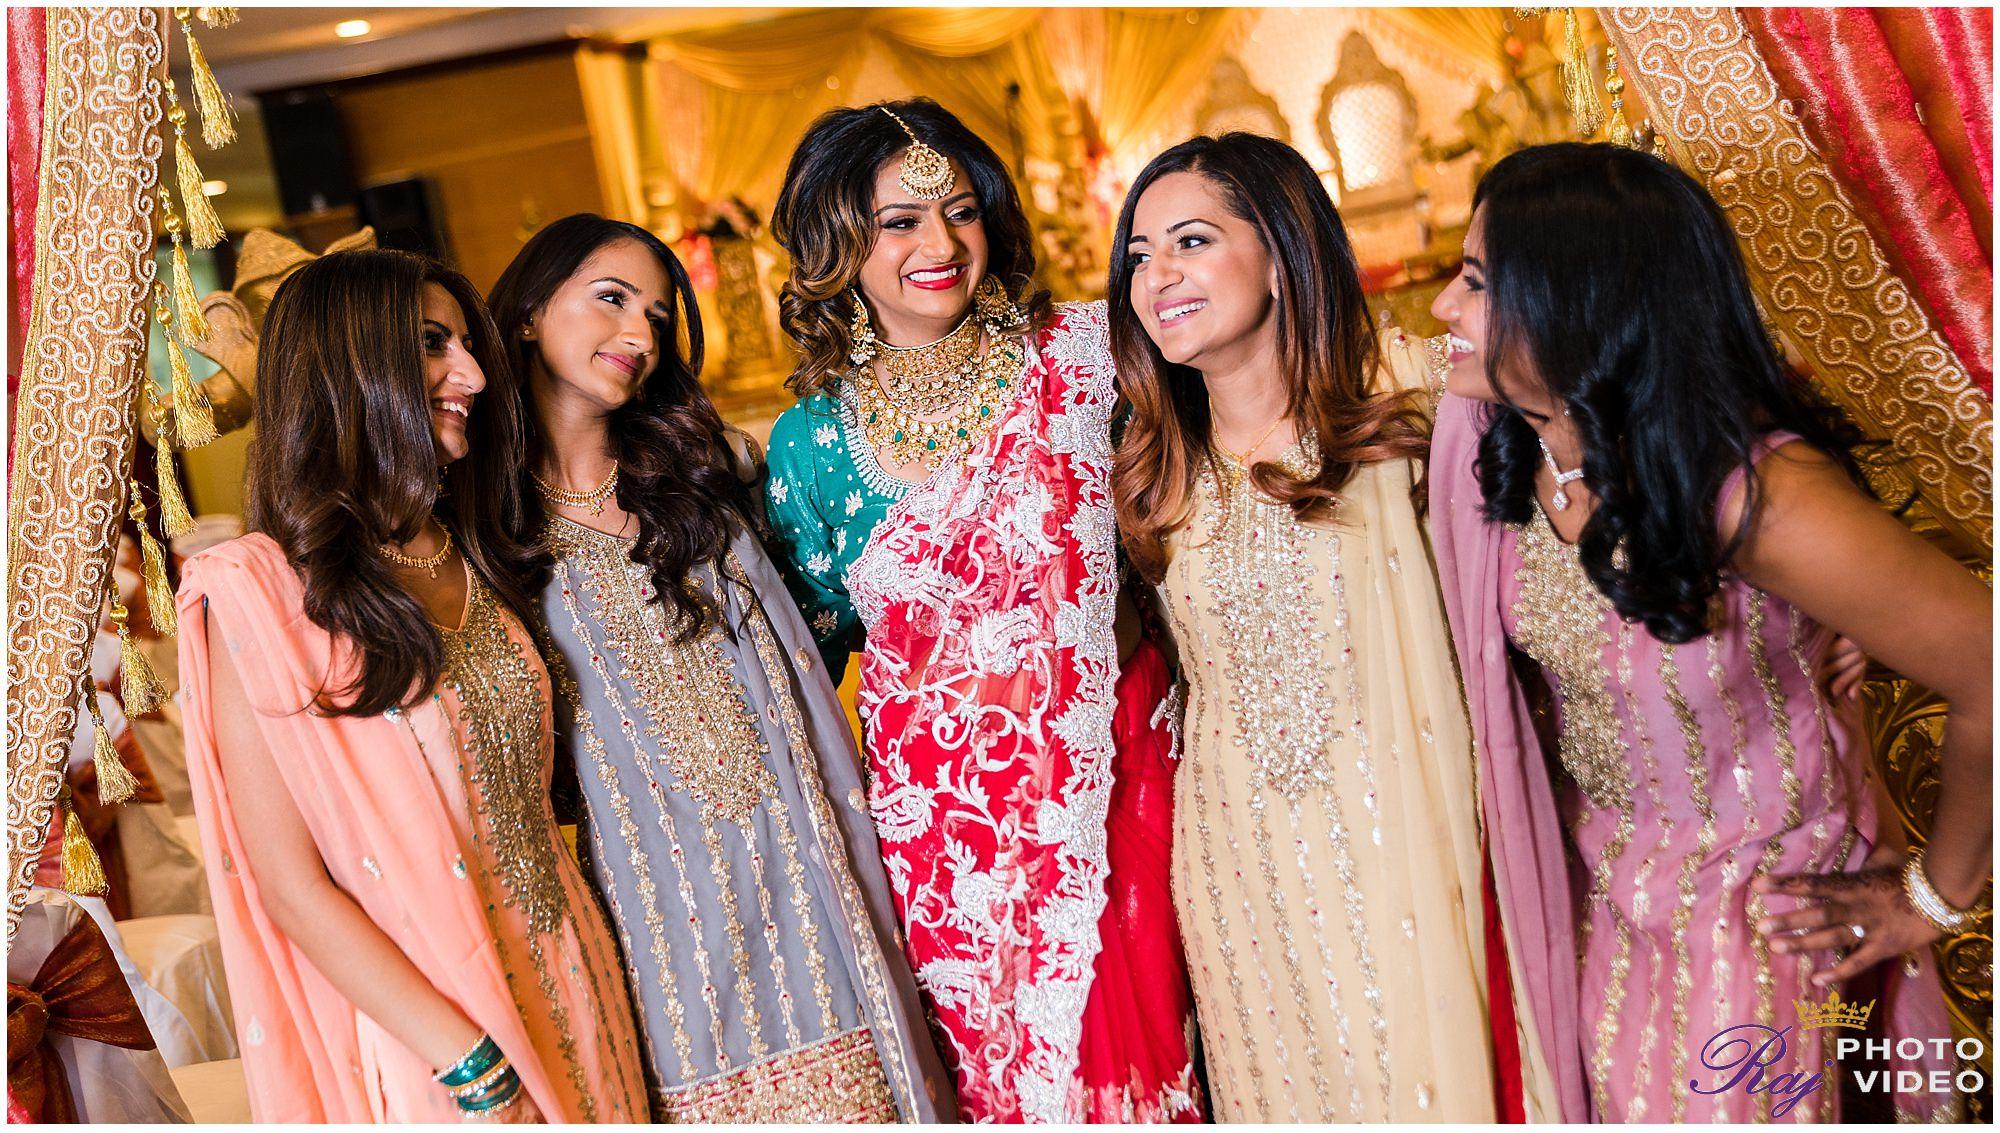 Sri-Guruvaayoorappan-Temple-Marlboro-NJ-Indian-Wedding-Chiyomi-Scott-00013.jpg